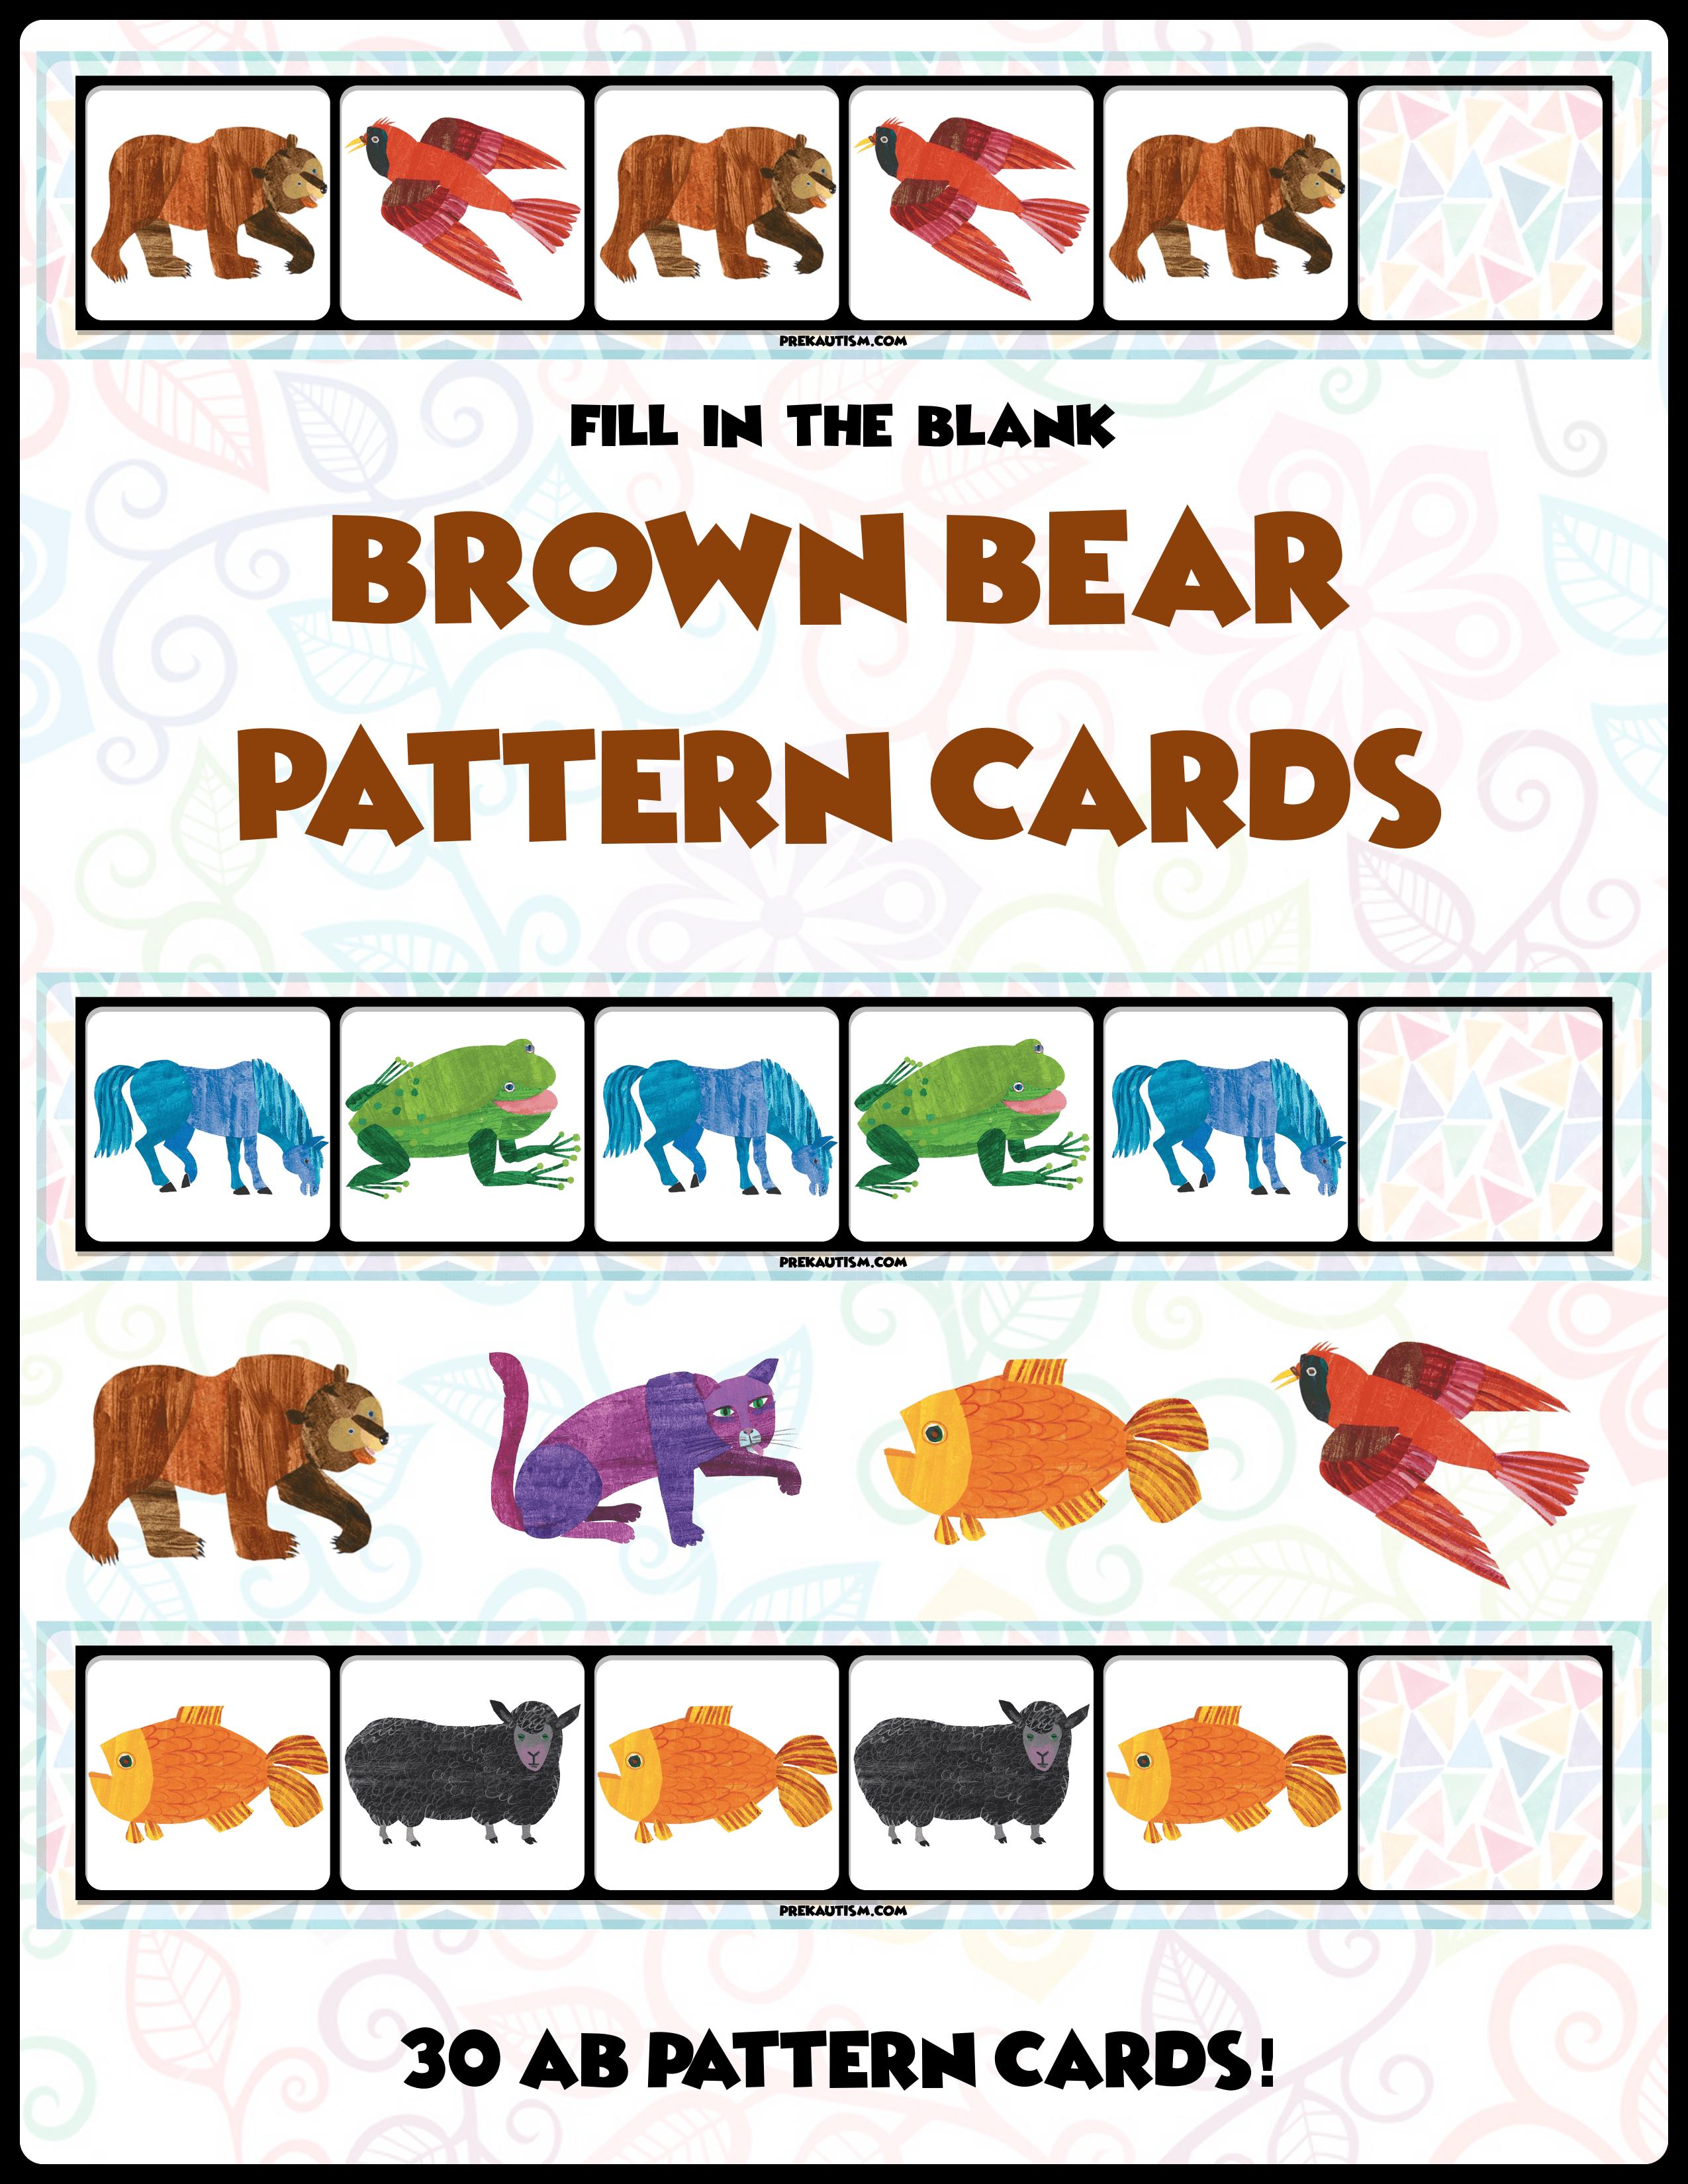 Brown Bear Ab Pattern Cards